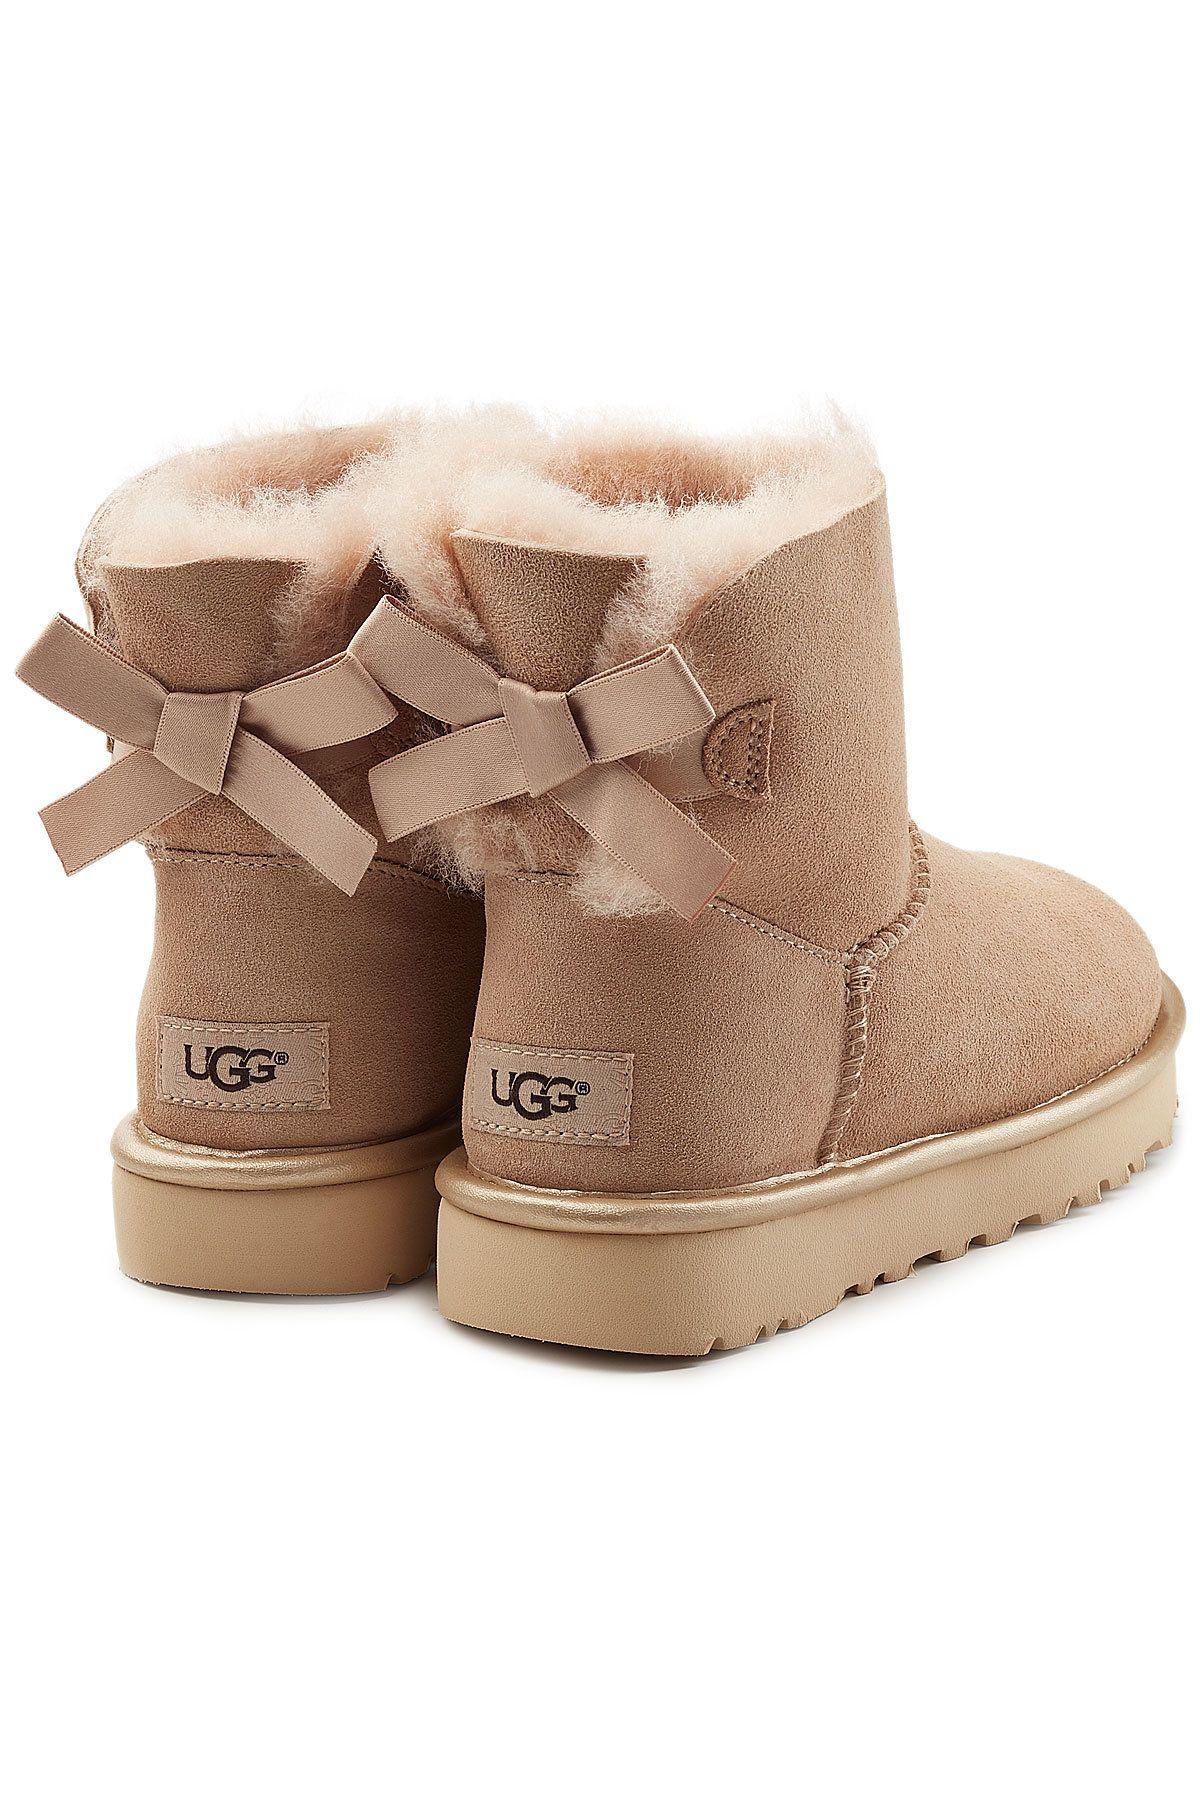 Ugg Mini Bailey Bow Suede Boots Ugg Boots Ugg Mini Black Ugg Boots